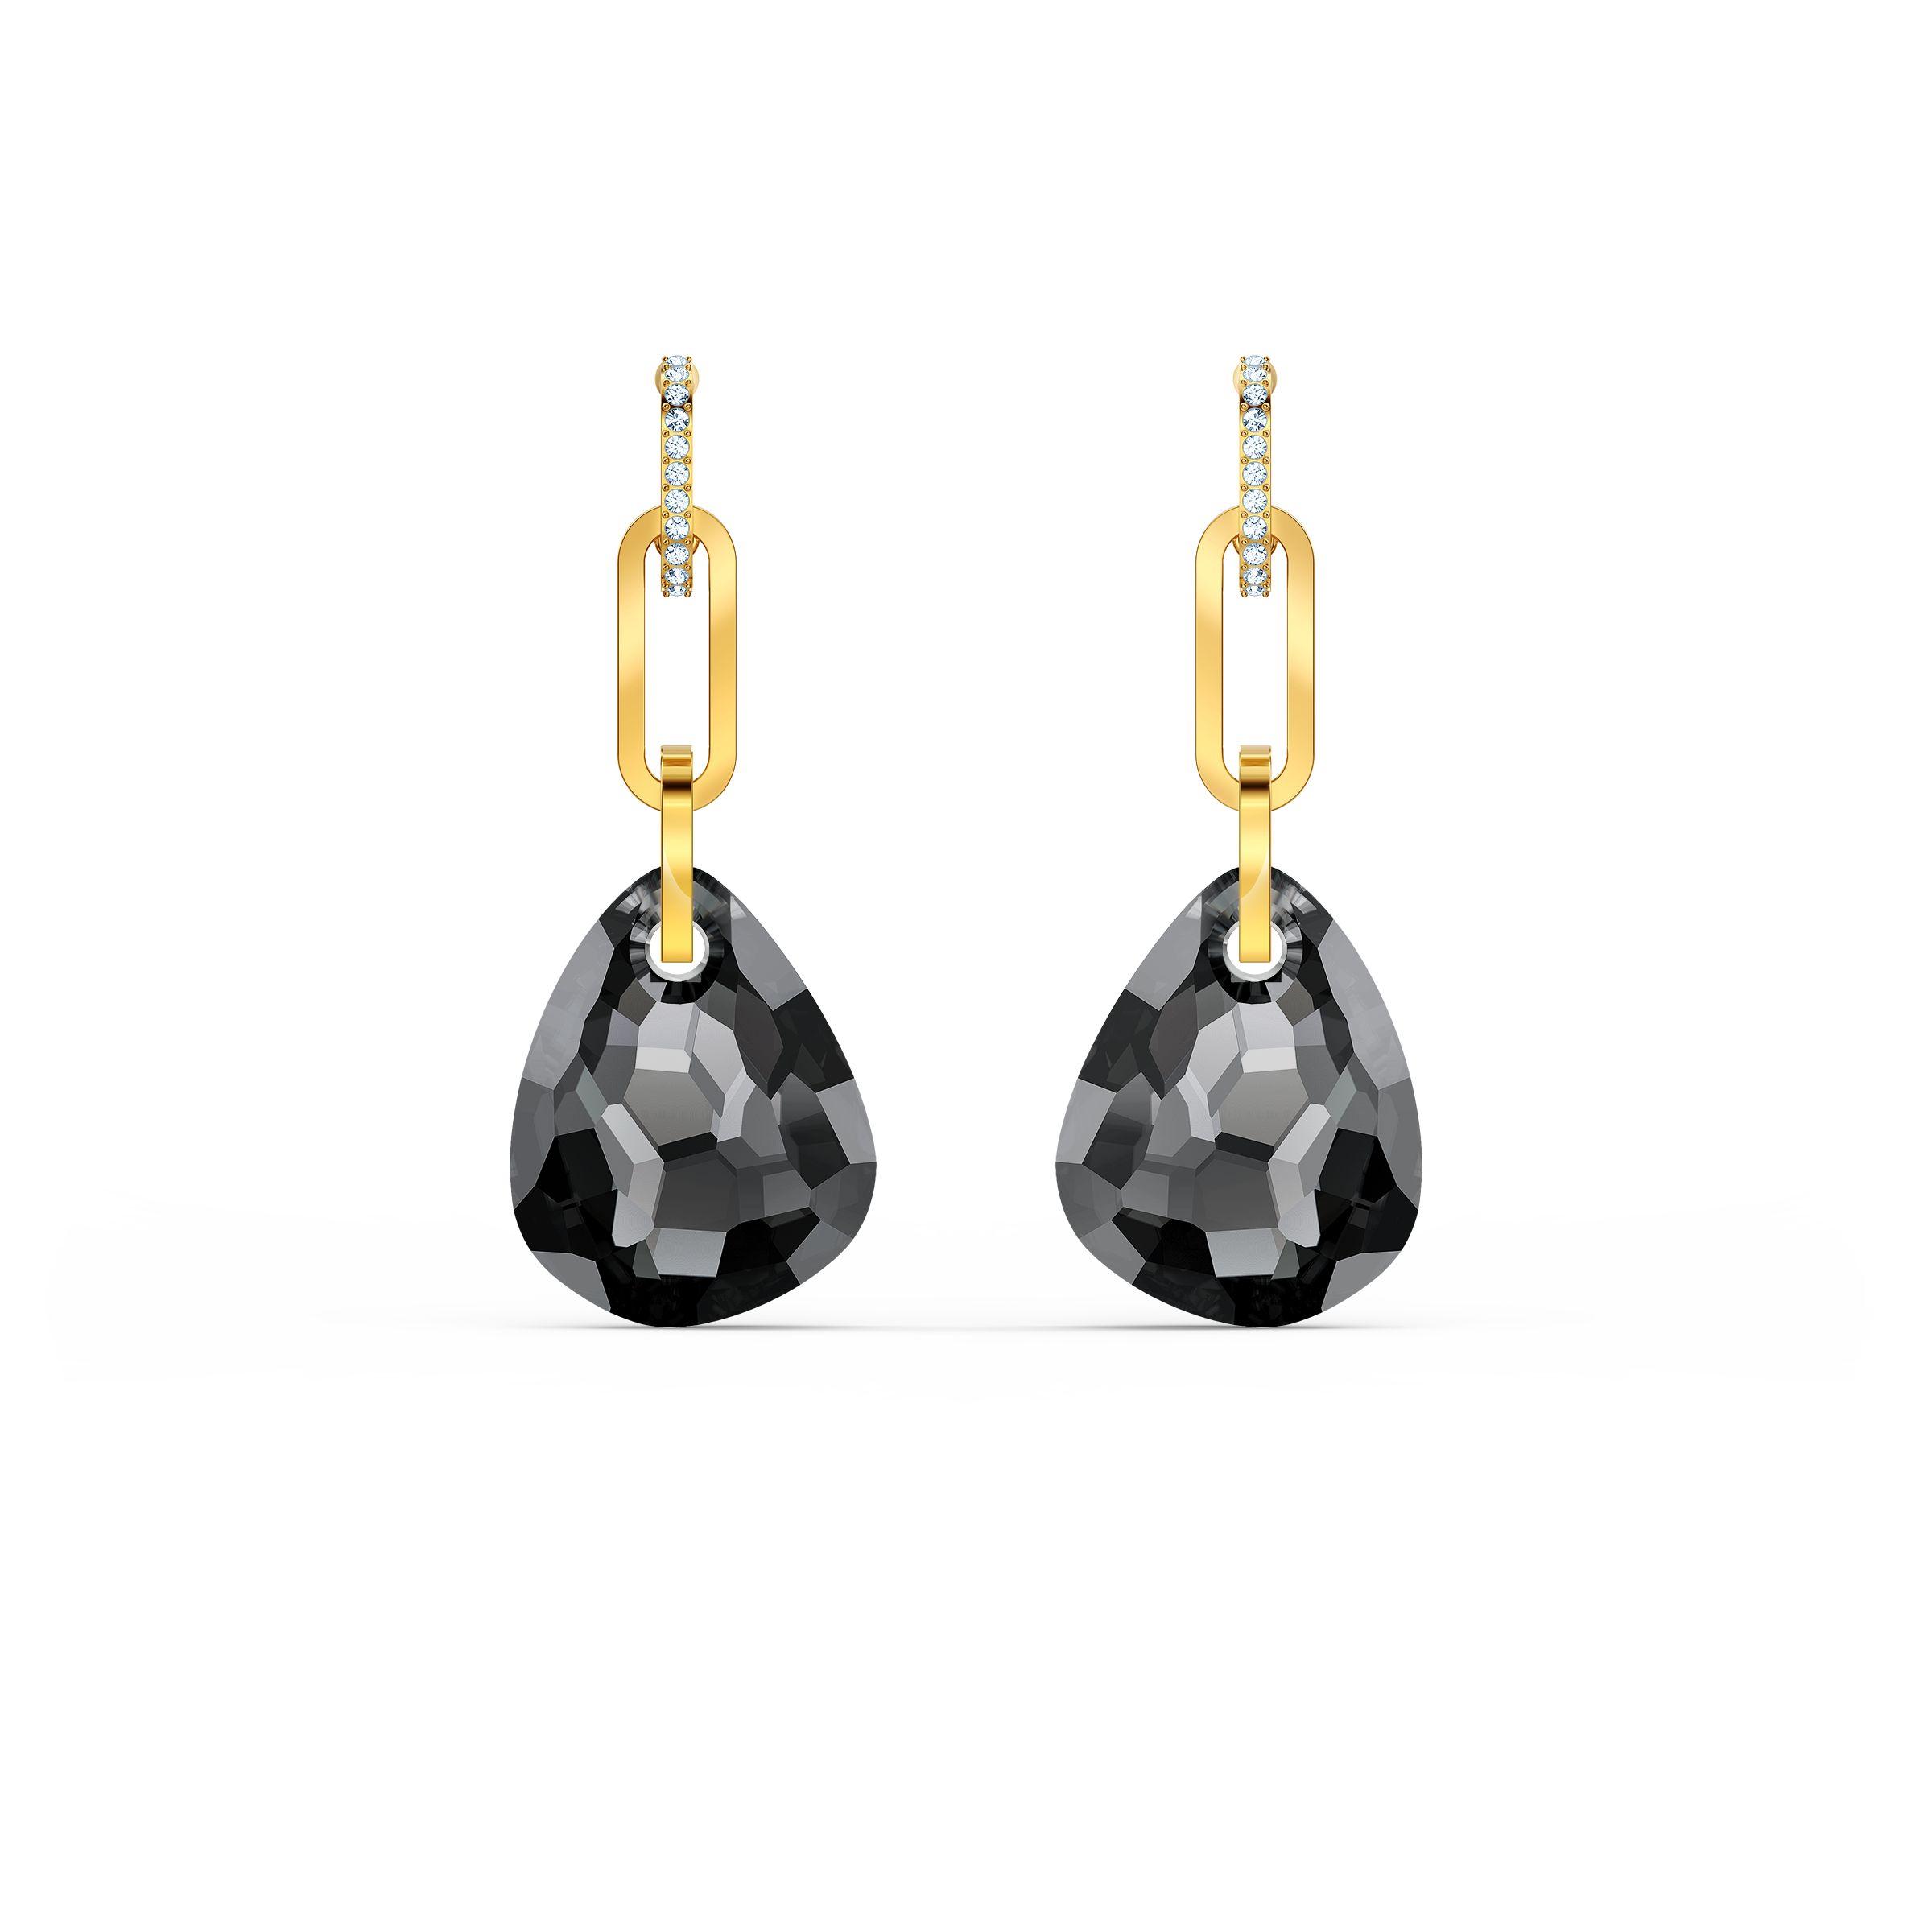 Boucles d'oreilles T Bar, medium, gris, métal doré, Swarovski